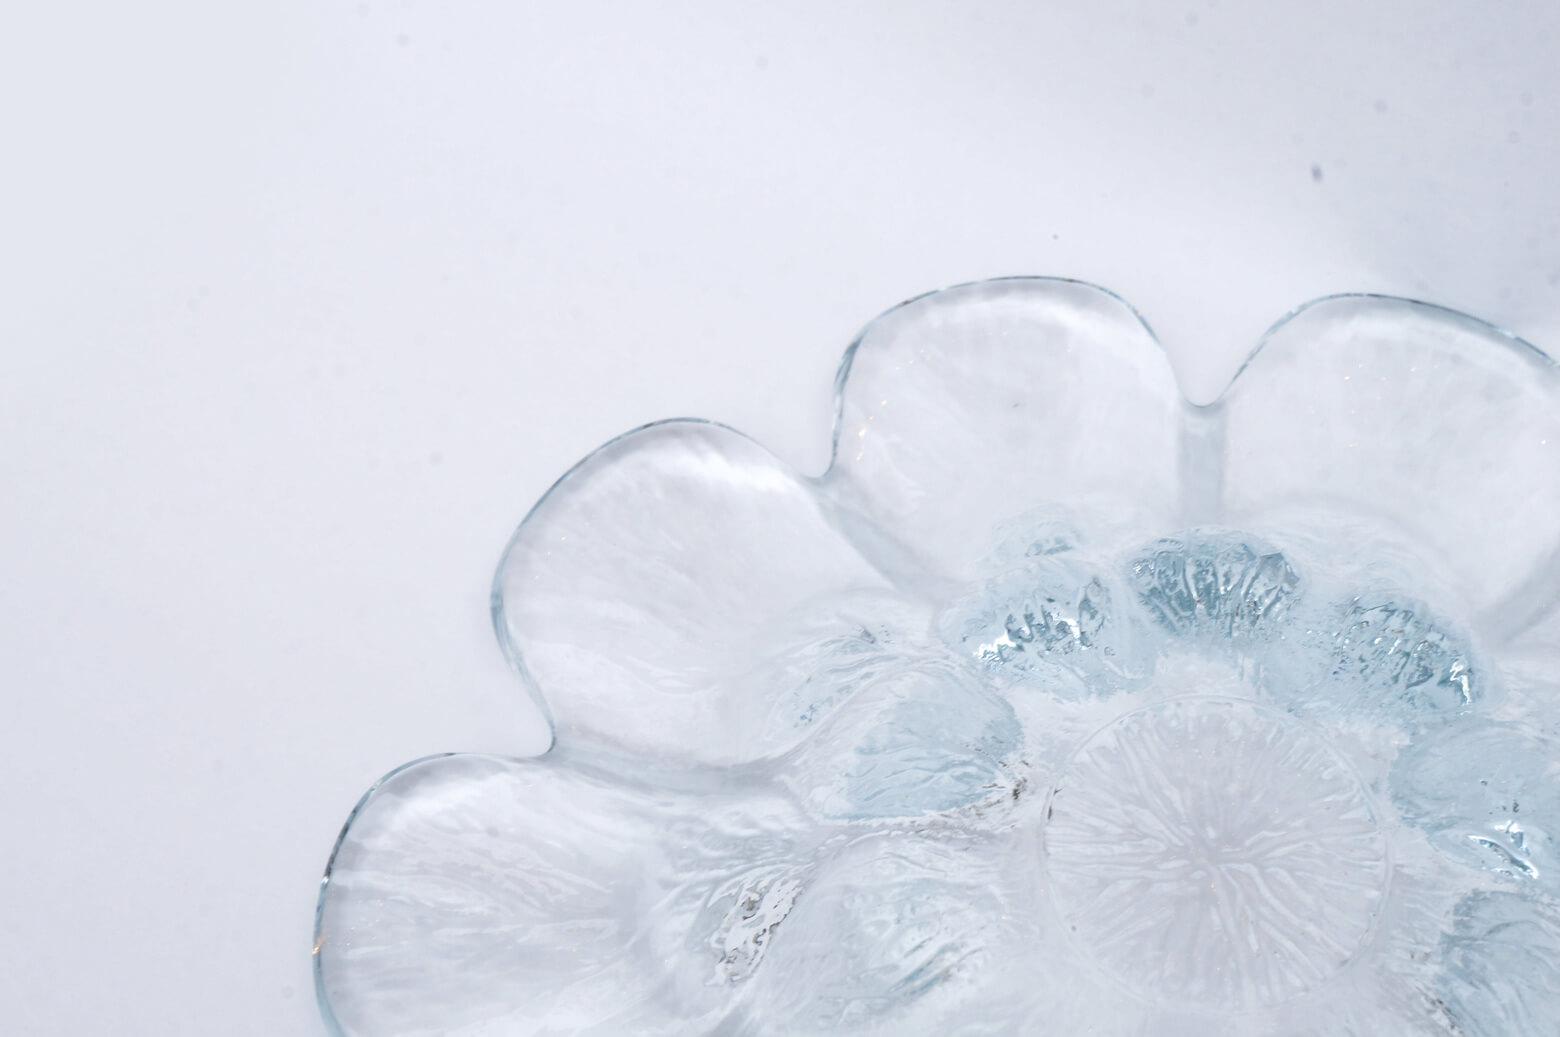 Holmegaard MULTI Candle Holder Glass Bowl Sidse Werner design/ホルムガード マルチ キャンドルホルダー ガラスボウル シセ・ヴェアナー 北欧雑貨 2